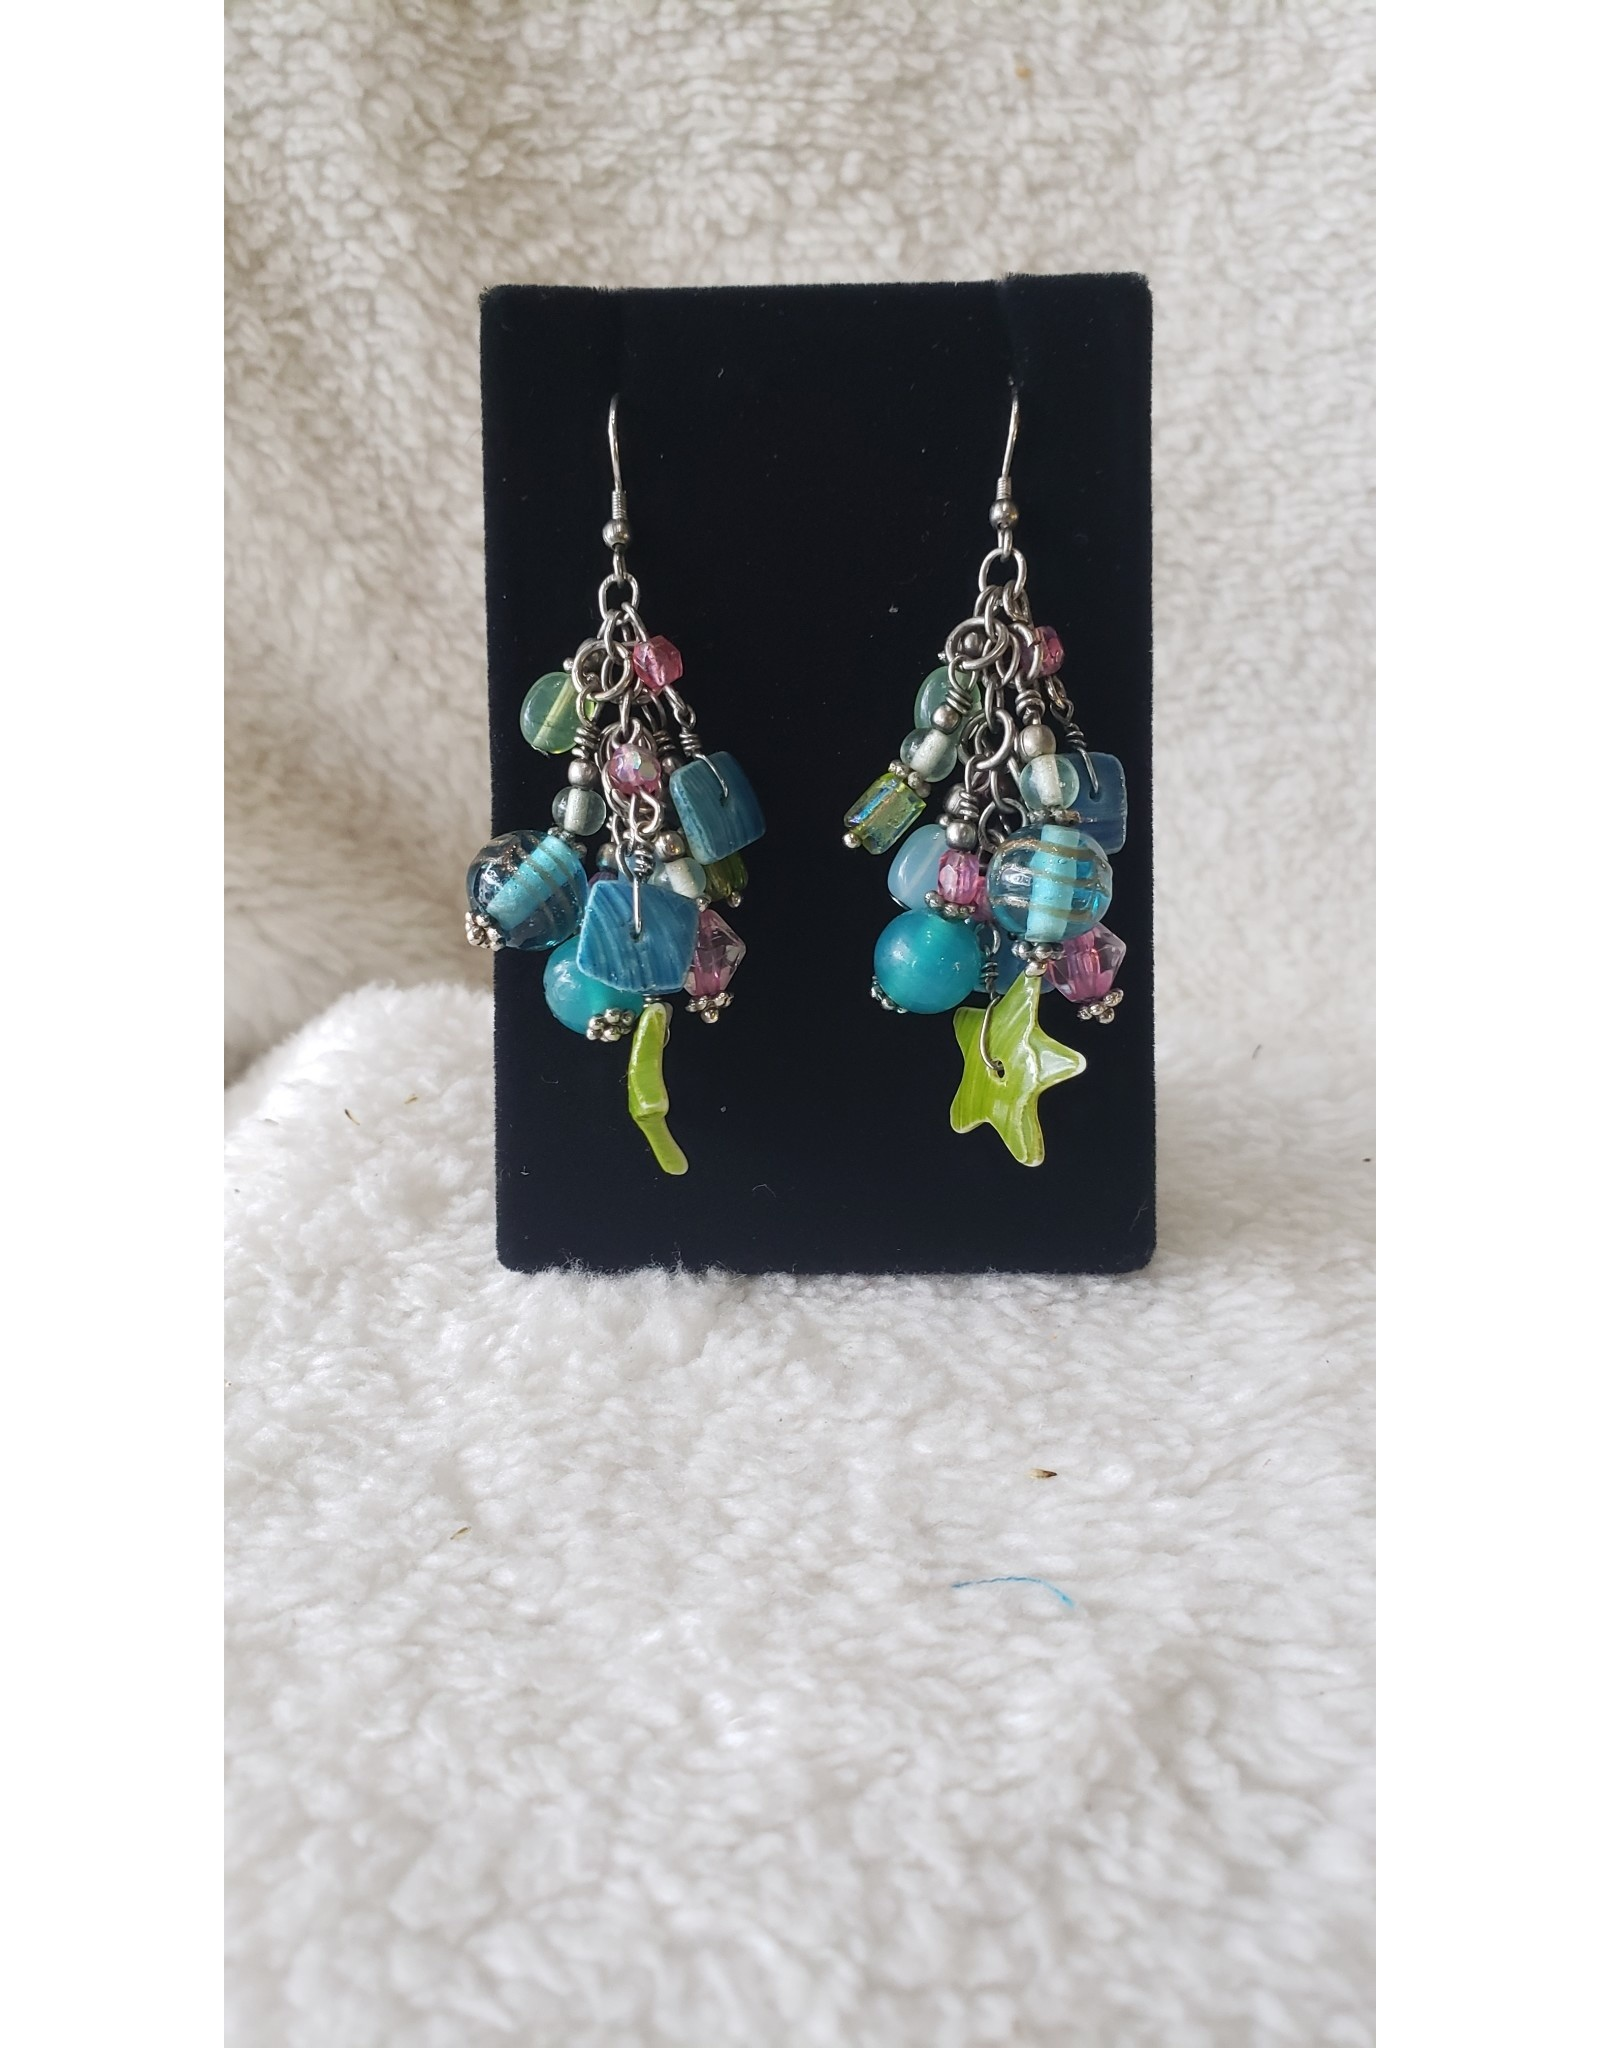 Assorted Green & Blue Bead Earrings